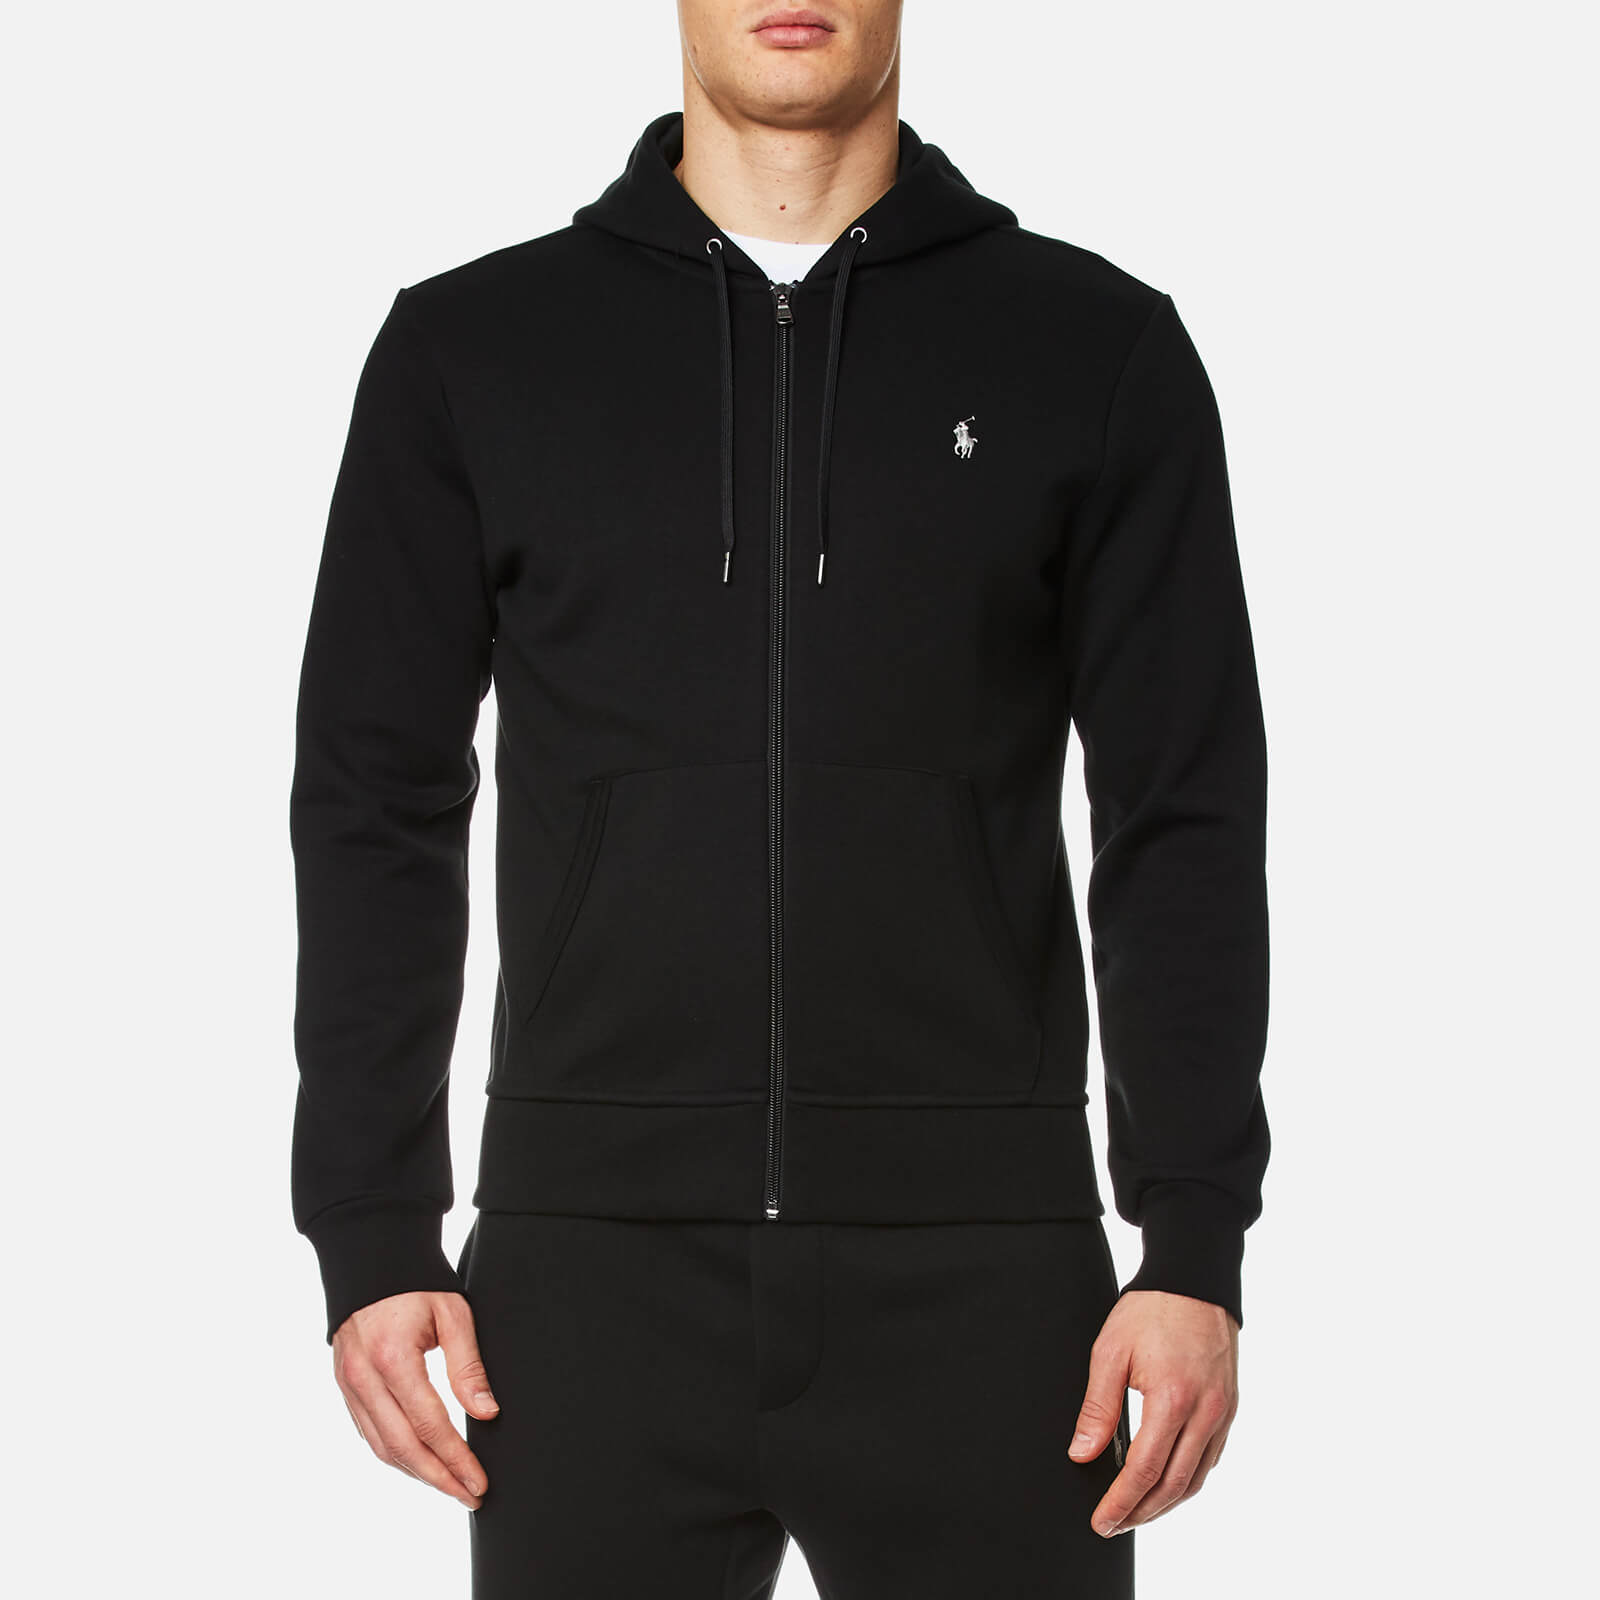 16e16aba6 Polo Ralph Lauren Men's Double Knit Zip Hoody - Polo Black